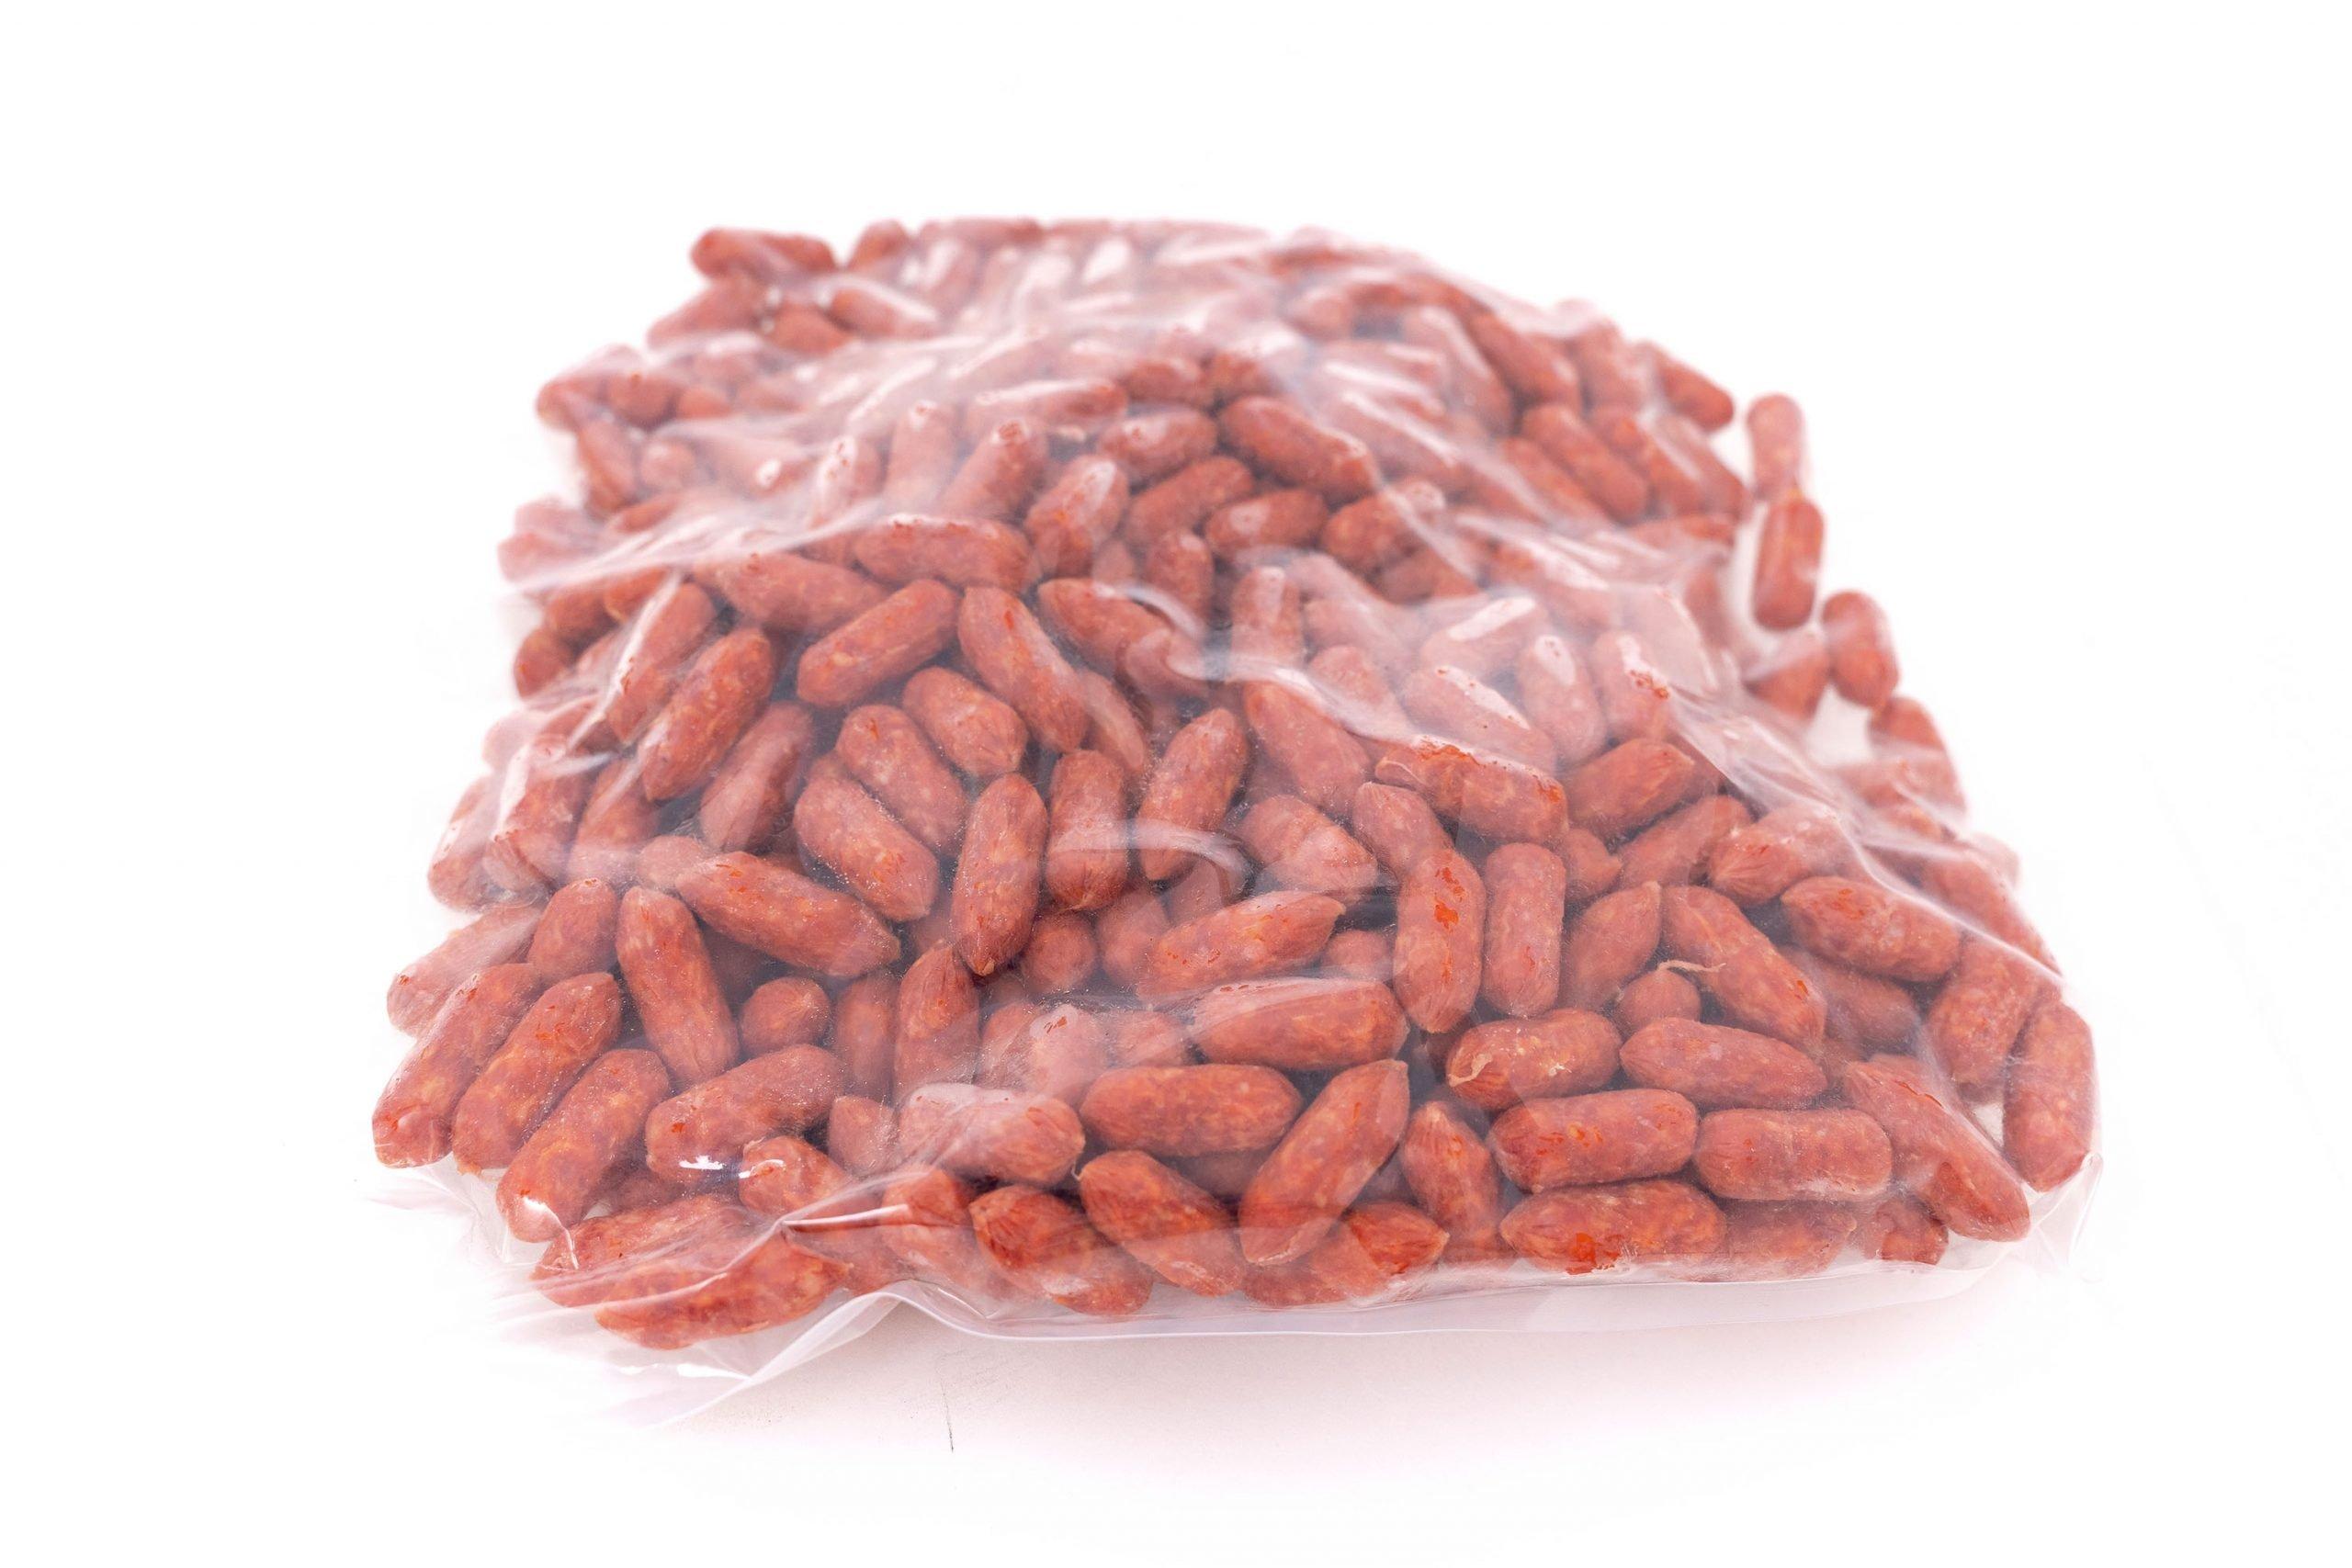 Spicy Salami snack